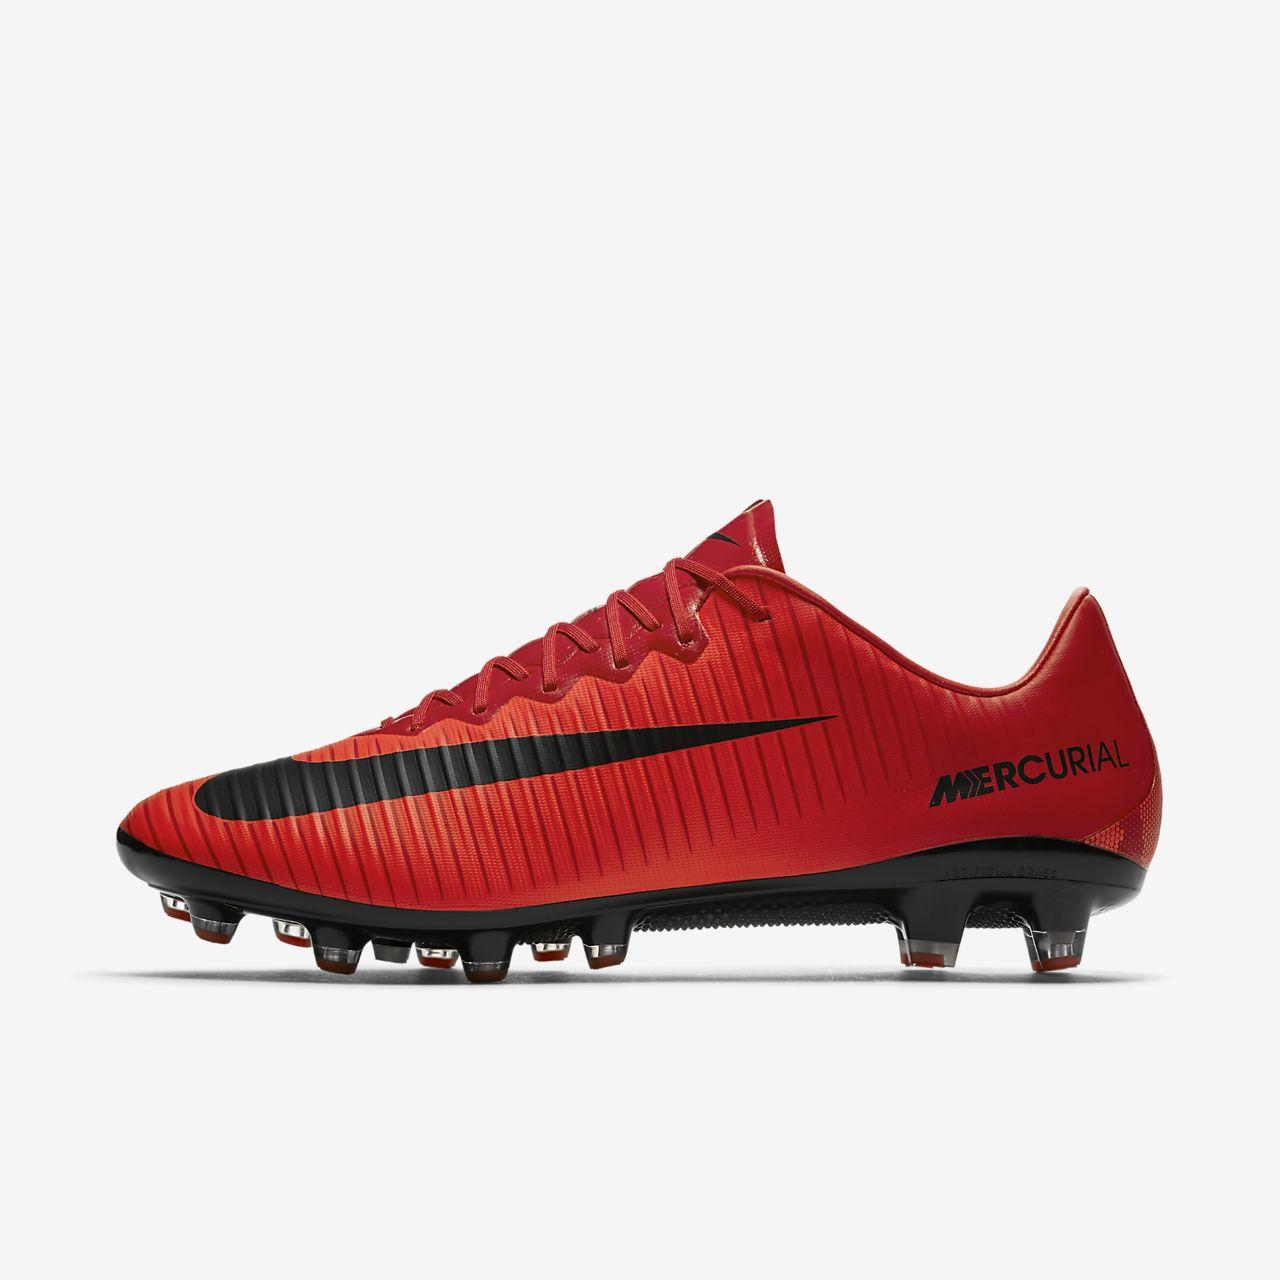 detailed look a3983 64c29 italy nike football boots mercurial orange and black e592b 83573  canada nike  mercurial vapor xi rouge and noir 2a97b fb1e6